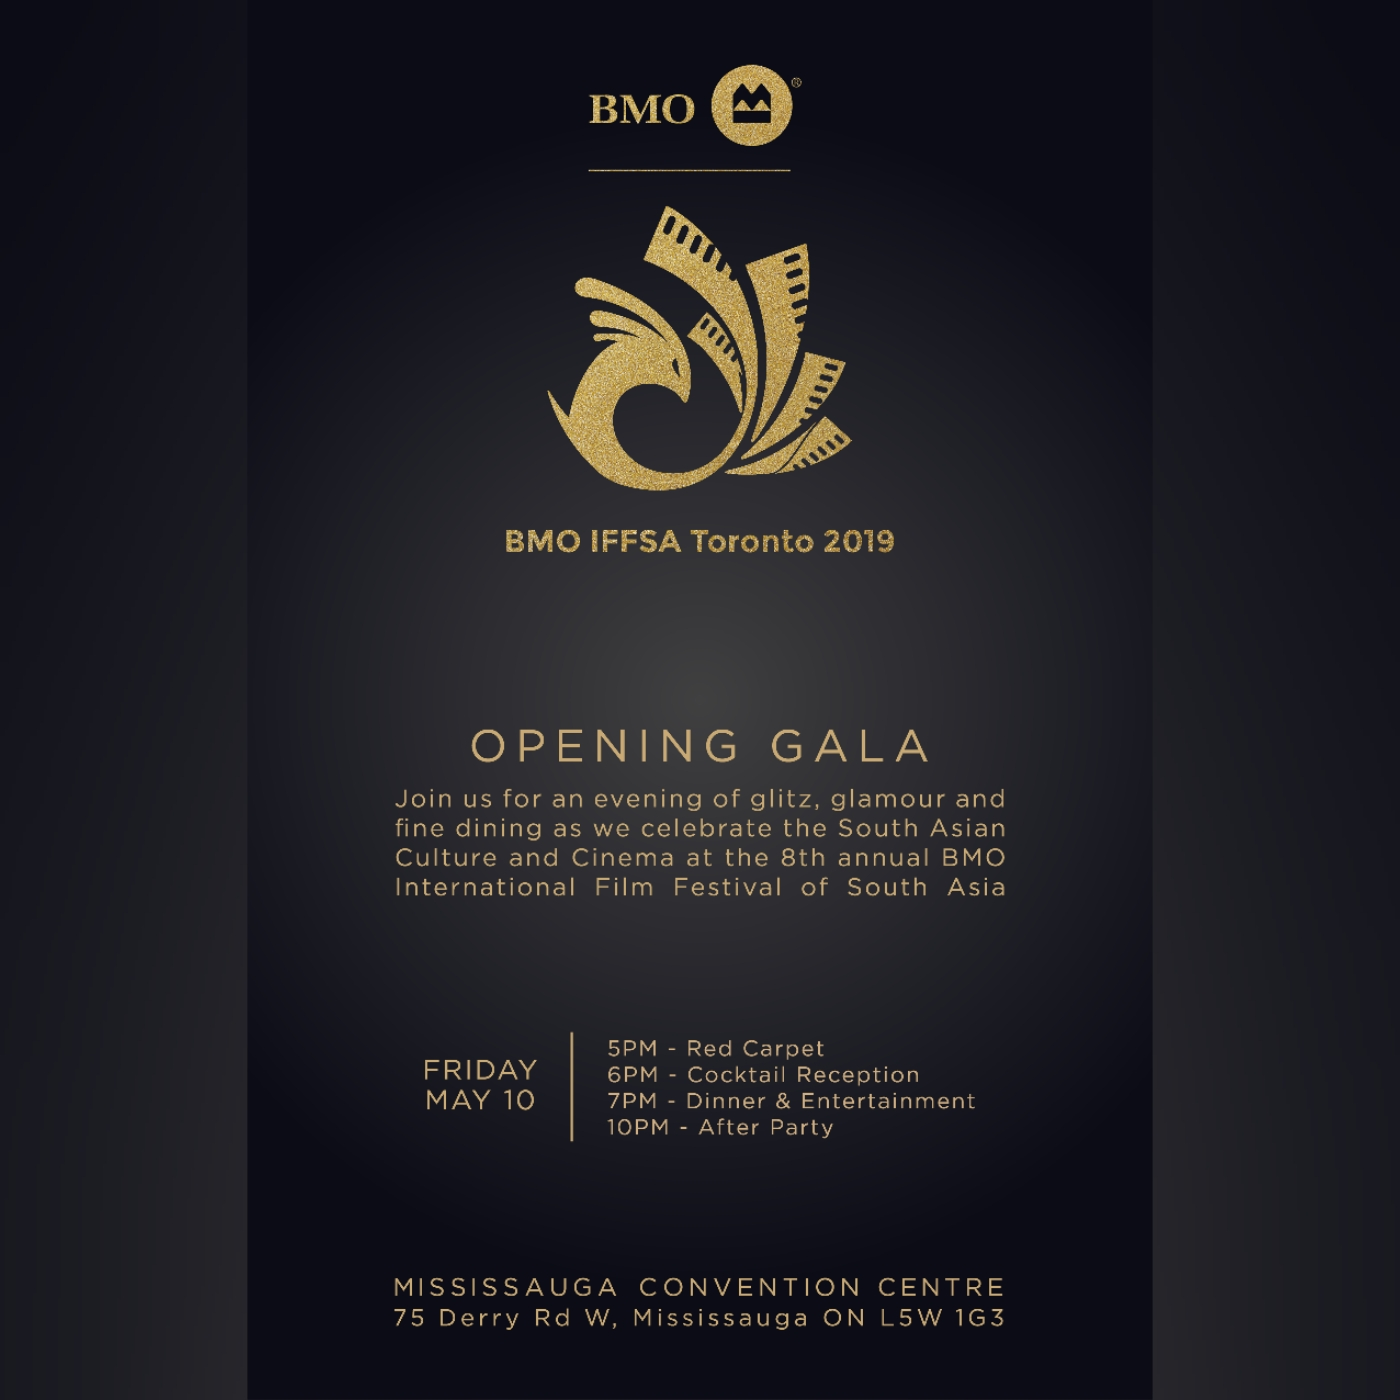 Opening Gala